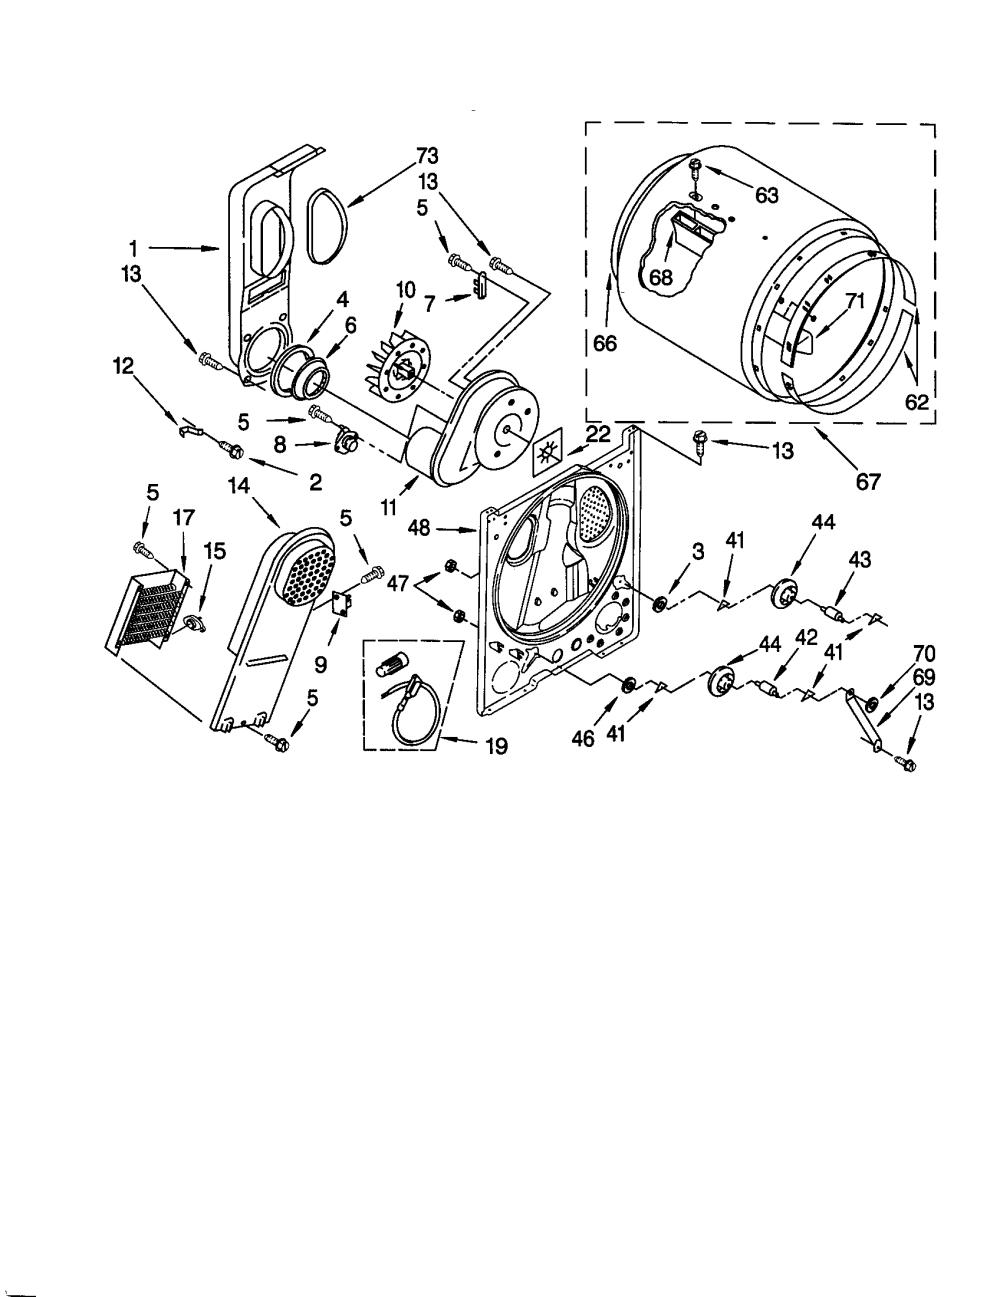 medium resolution of model wiring whirlpool diagram dryer ler7646aw2